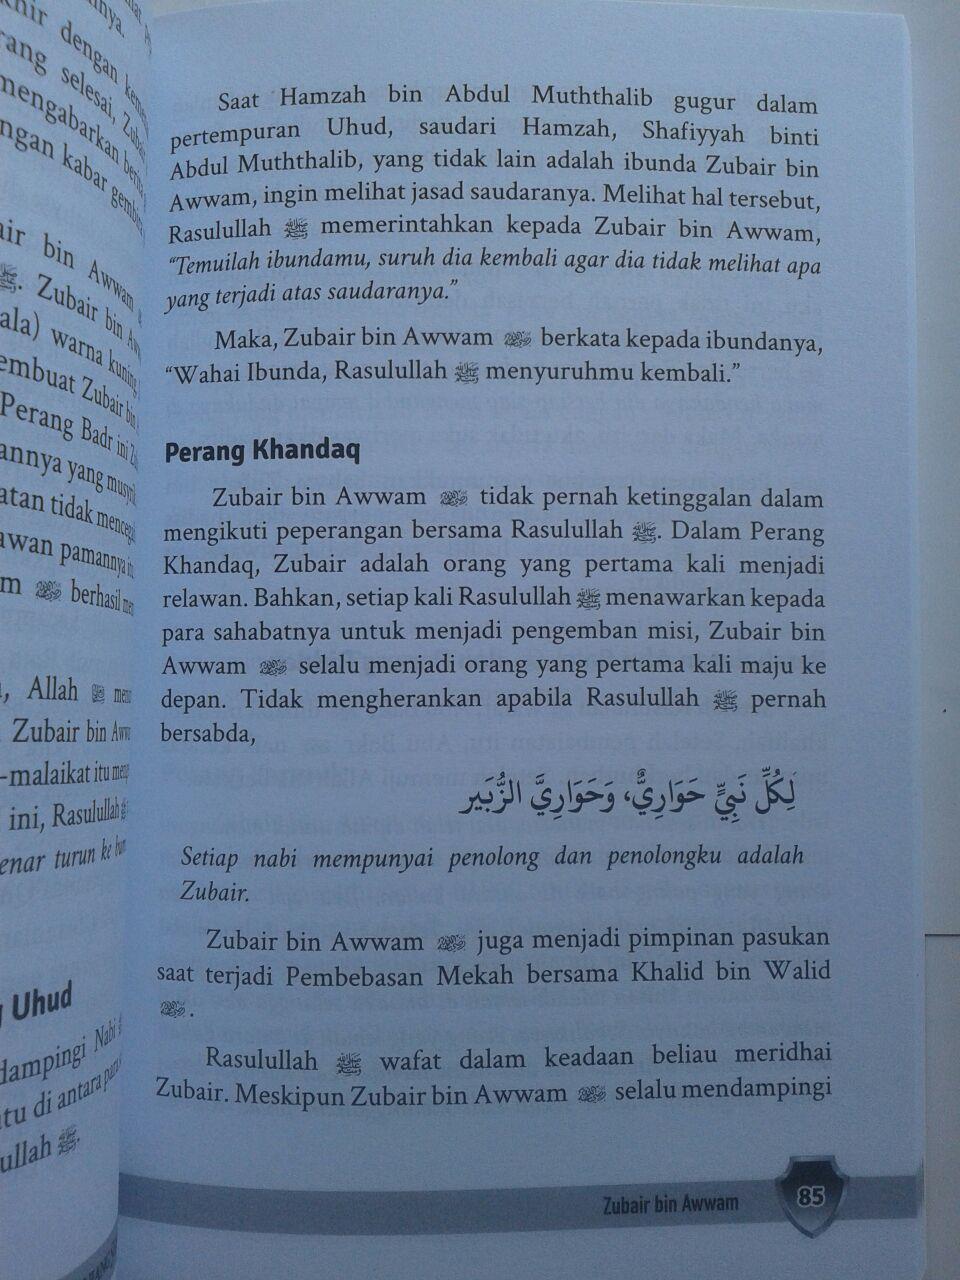 Buku Jenderal Islam Paling Berpengaruh Sepanjang Sejarah isi